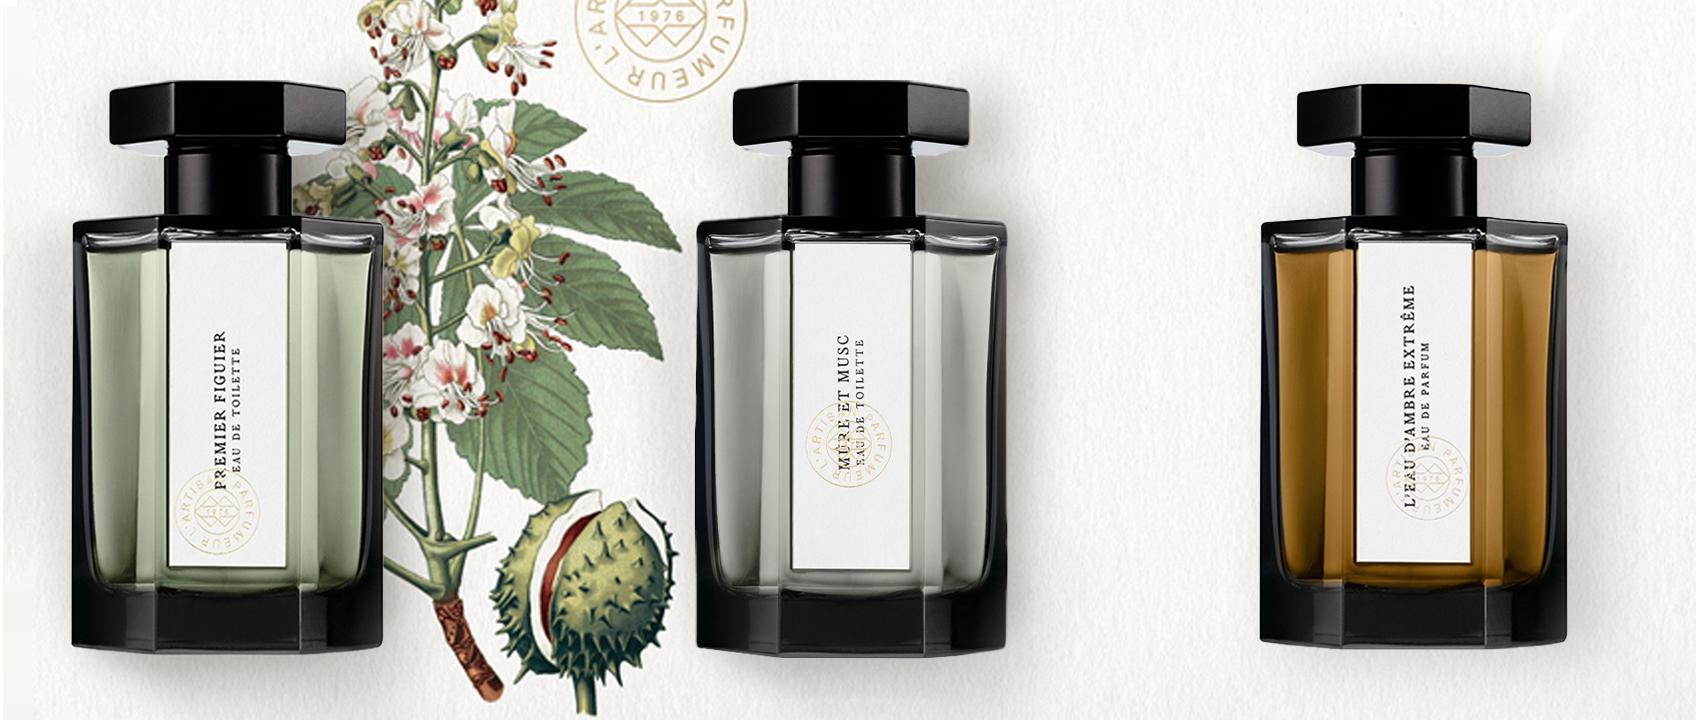 Brand Spotlight – L'Artisan Parfumeur